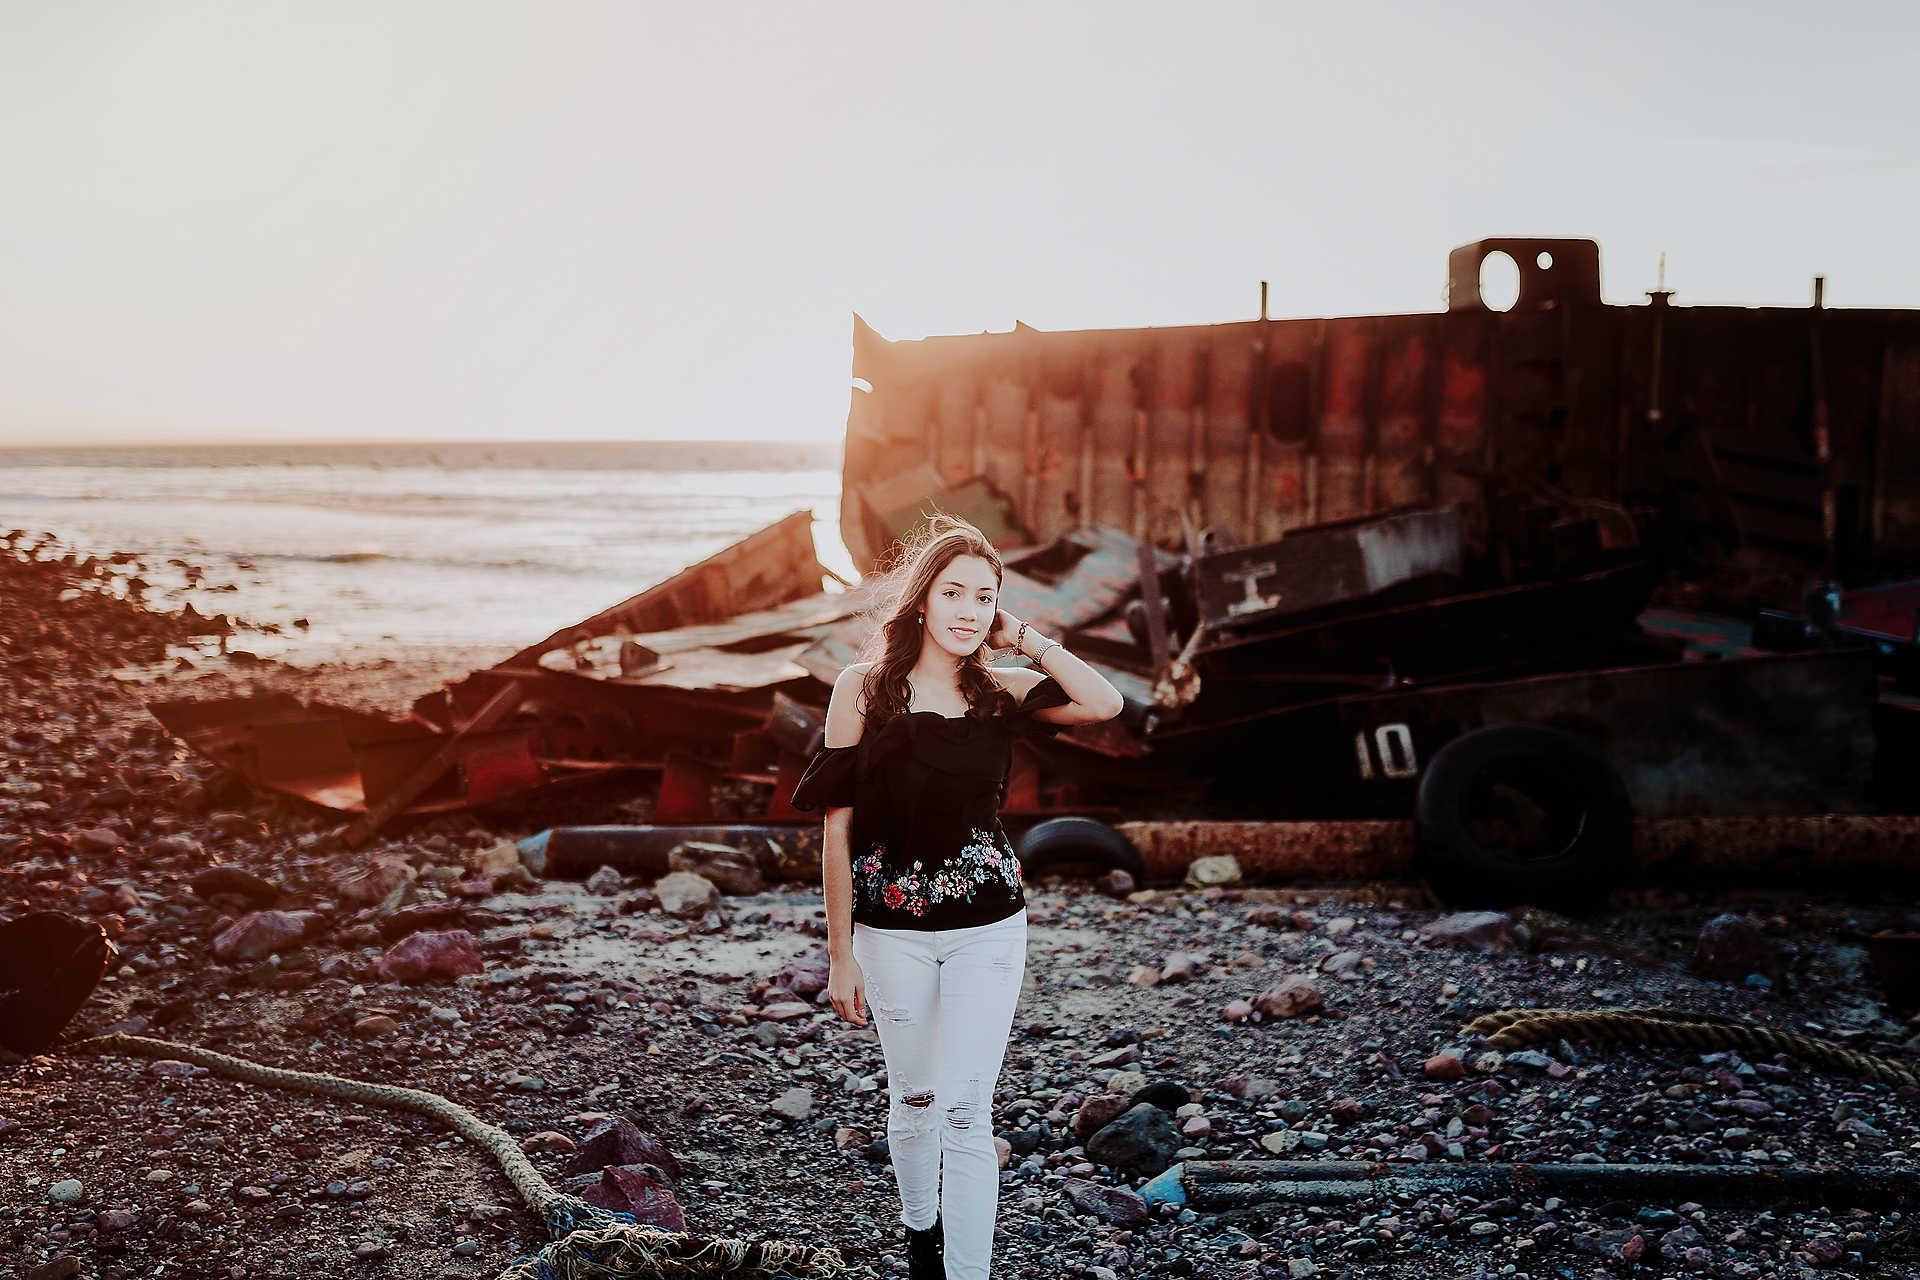 daniel-cante-fotografó-quince-años-la-paz-baja-california-sur-bcs-028.jpg